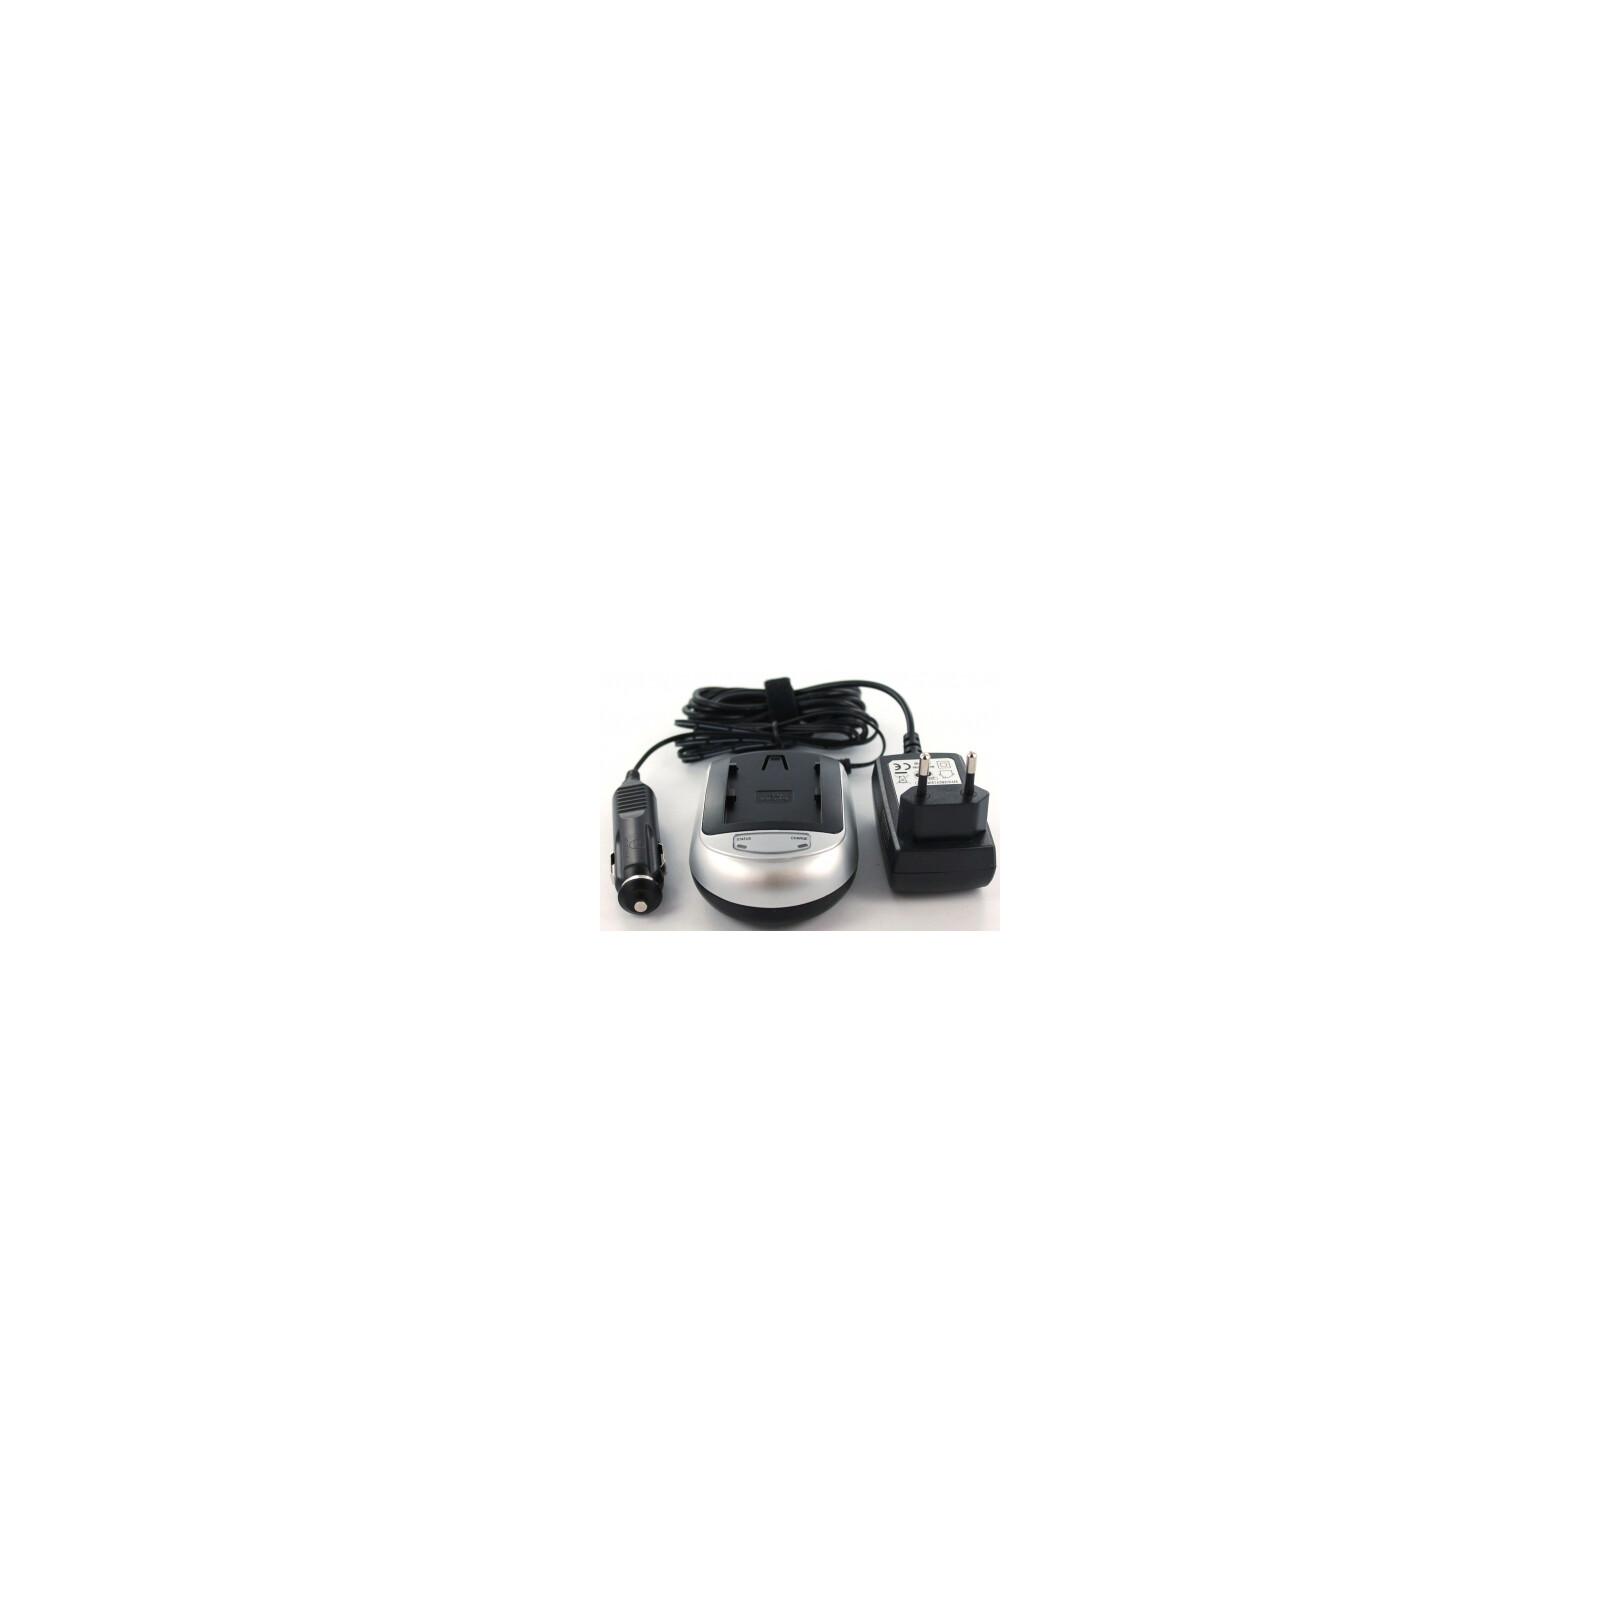 AGI 71101 Ladegerät Canon Eos 5D Mark II